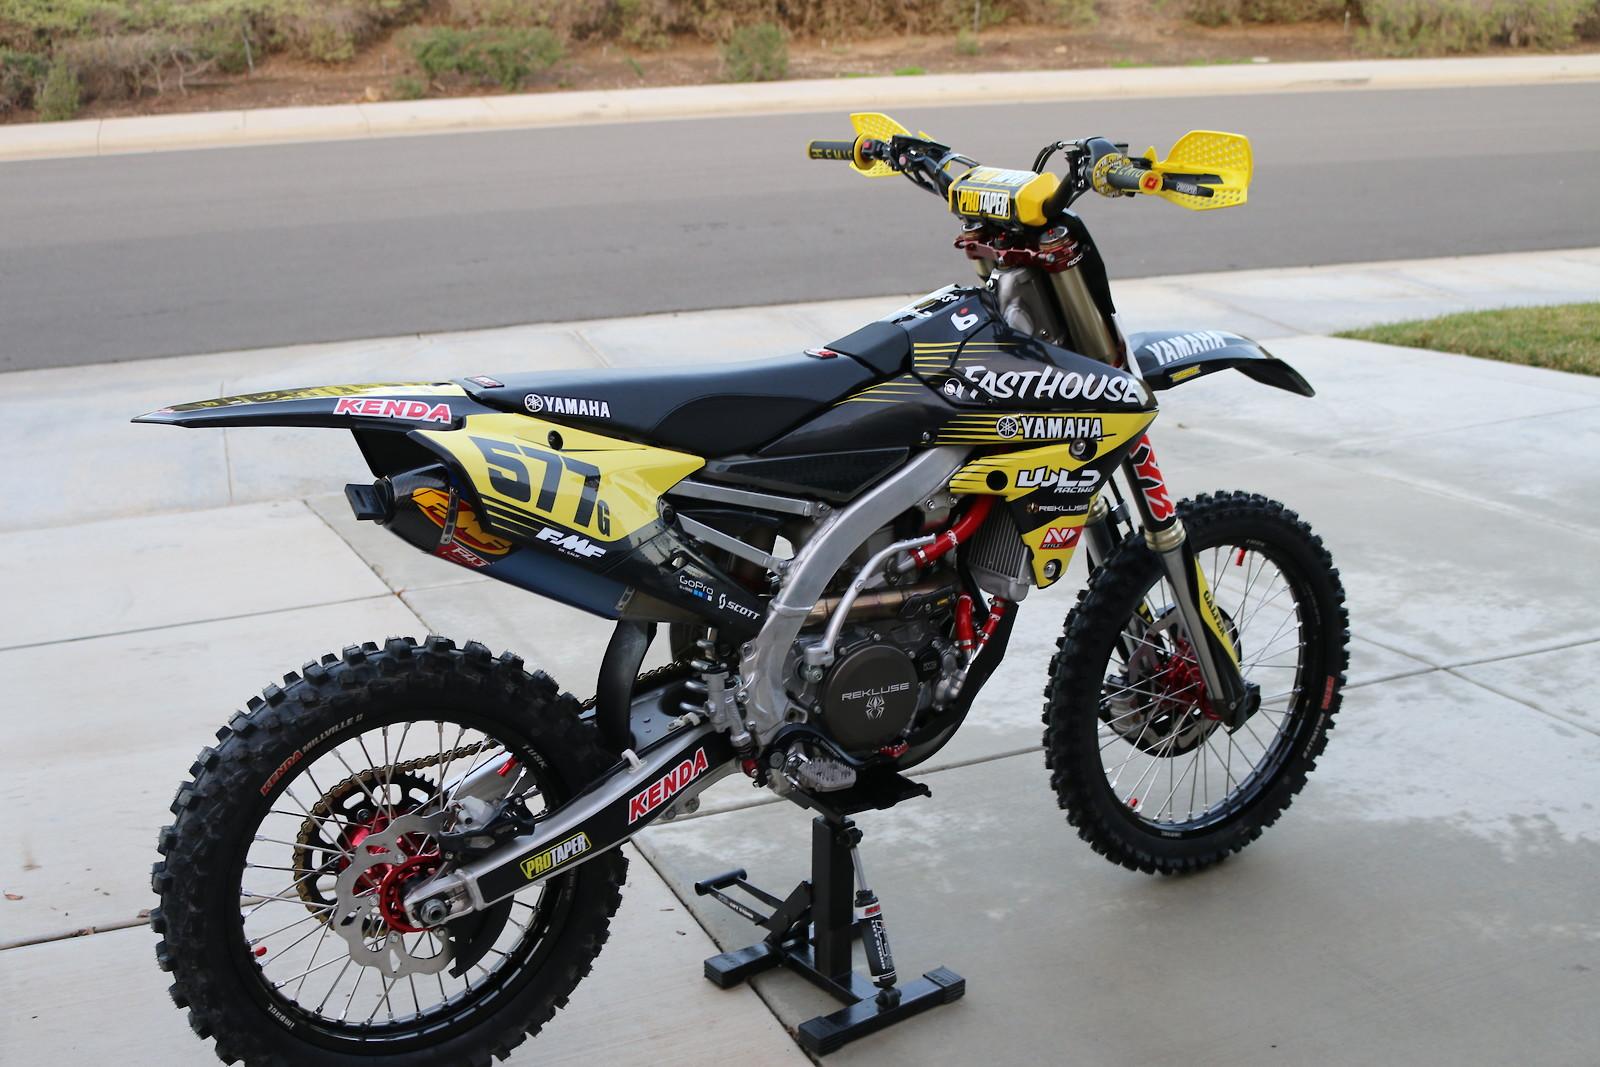 IMG 5891 - WLD - Motocross Pictures - Vital MX